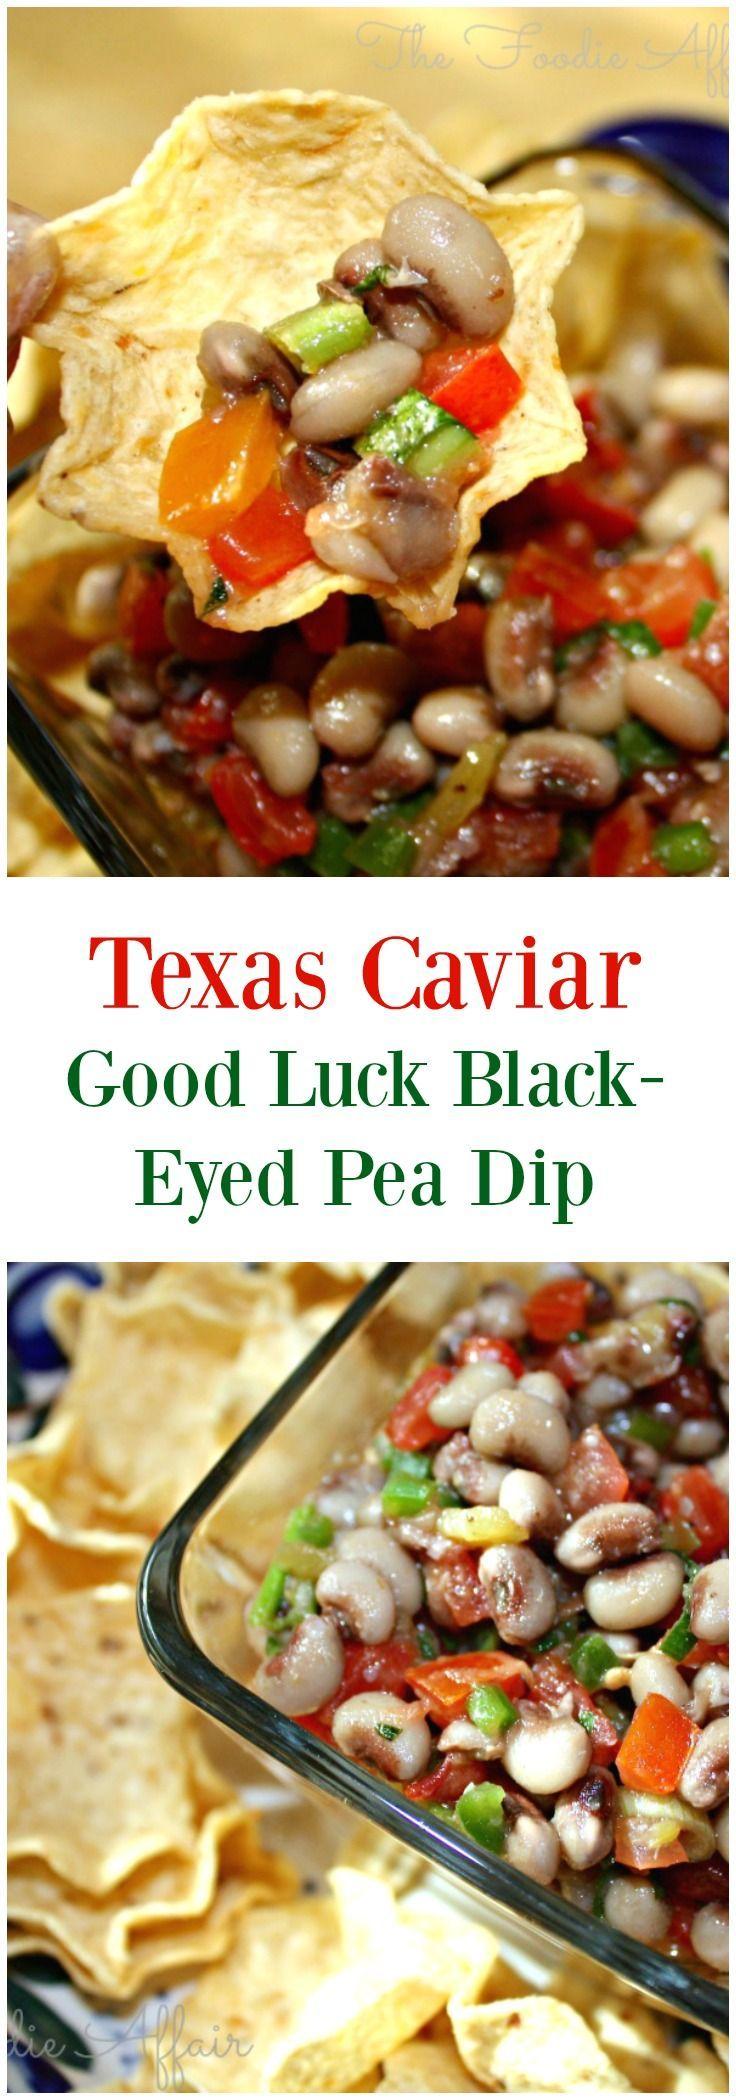 Texas Caviar, Good Luck BlackEyed Pea Dip Recipe Diy